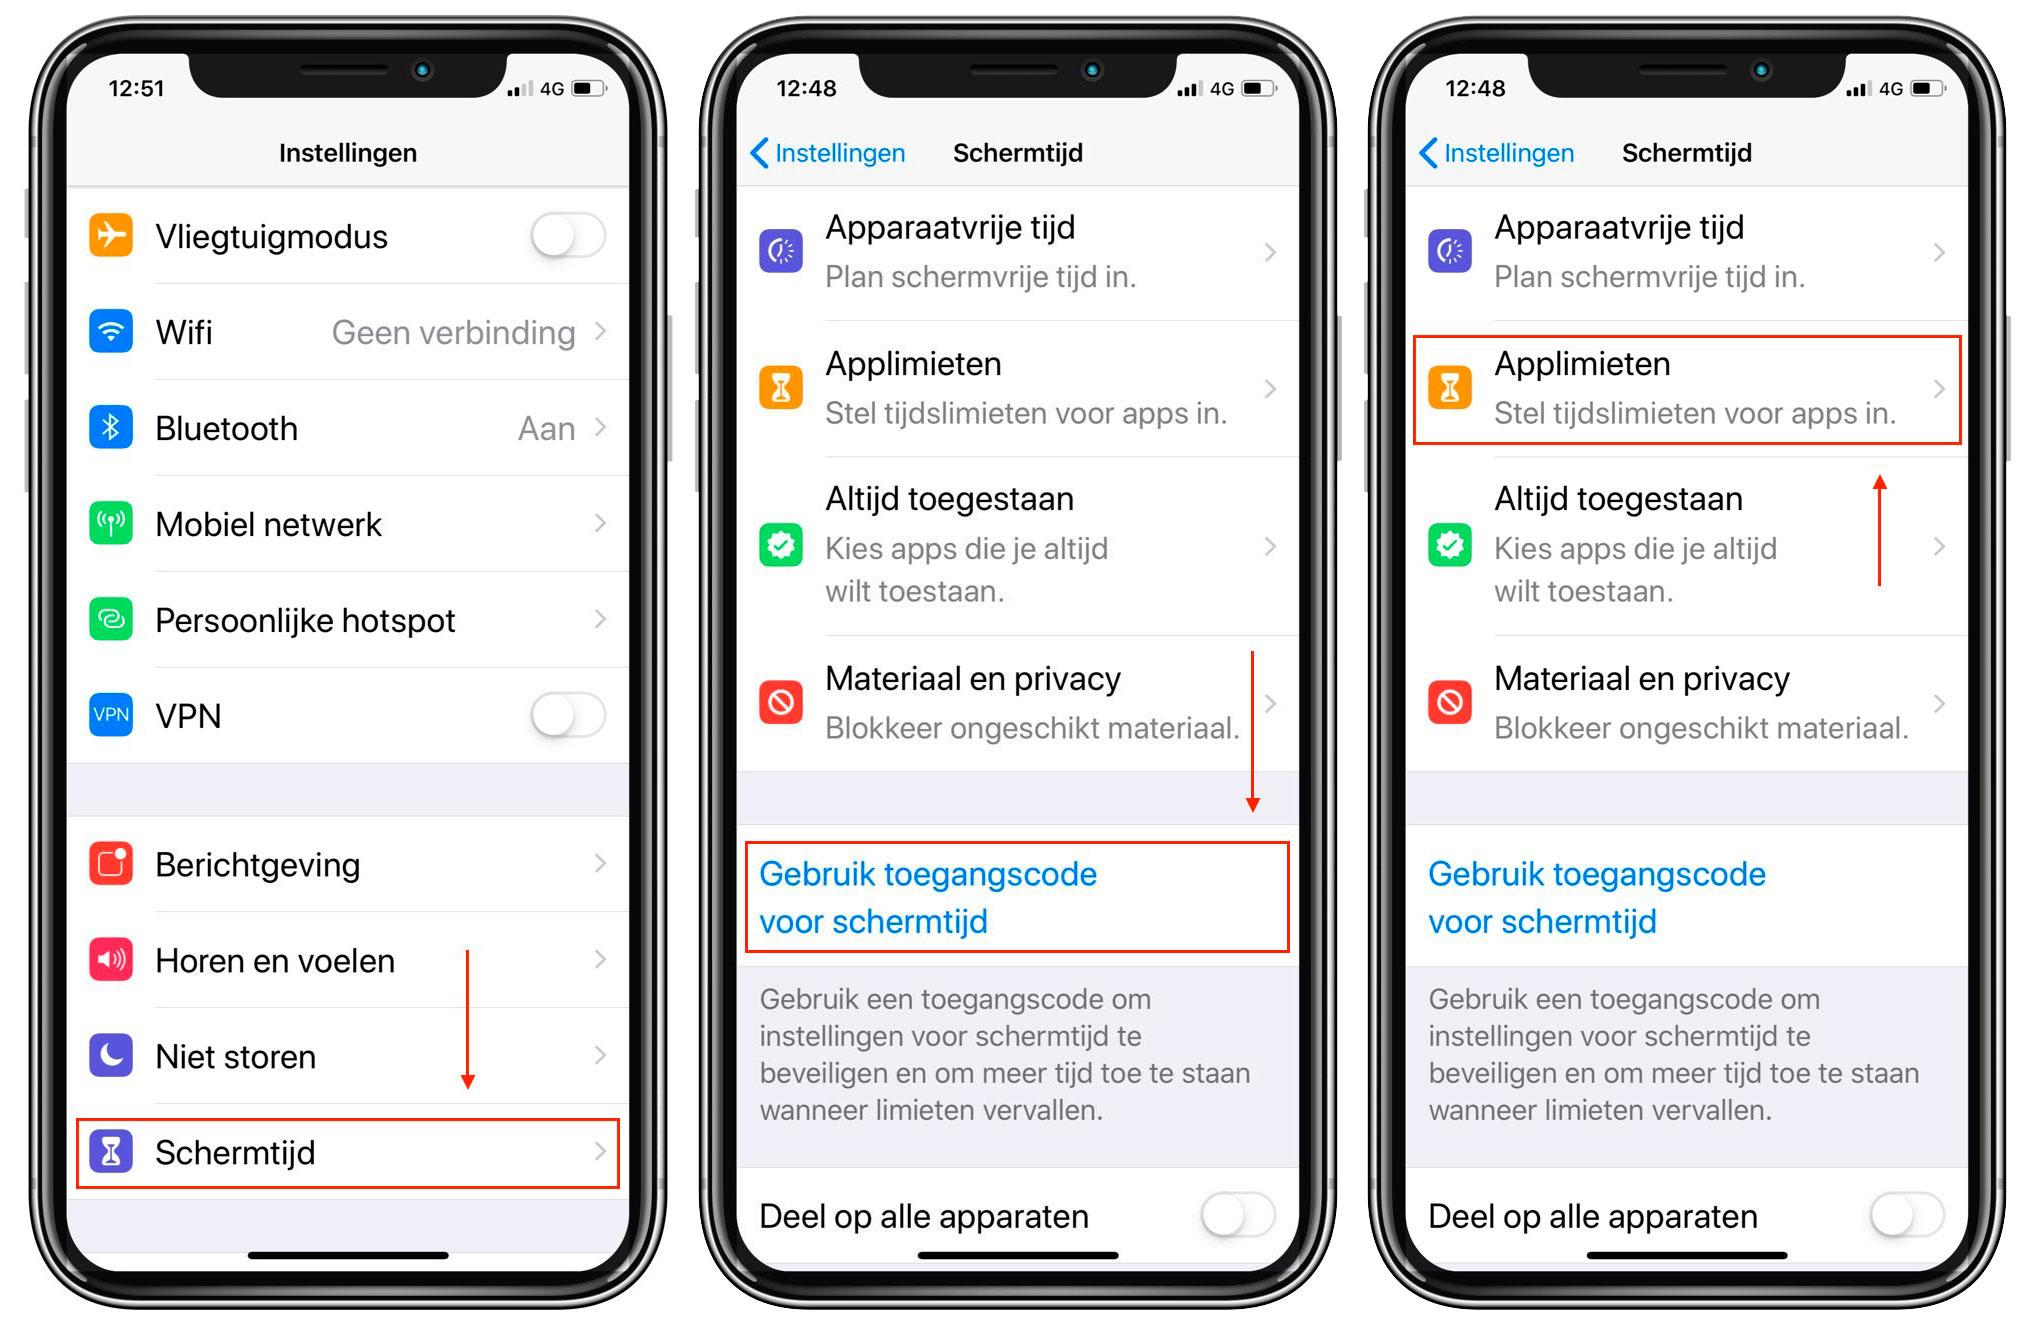 https://www.macfreak.nl/modules/news/images/zArt.SchermtijdAlsAppBeveiling-1.jpg